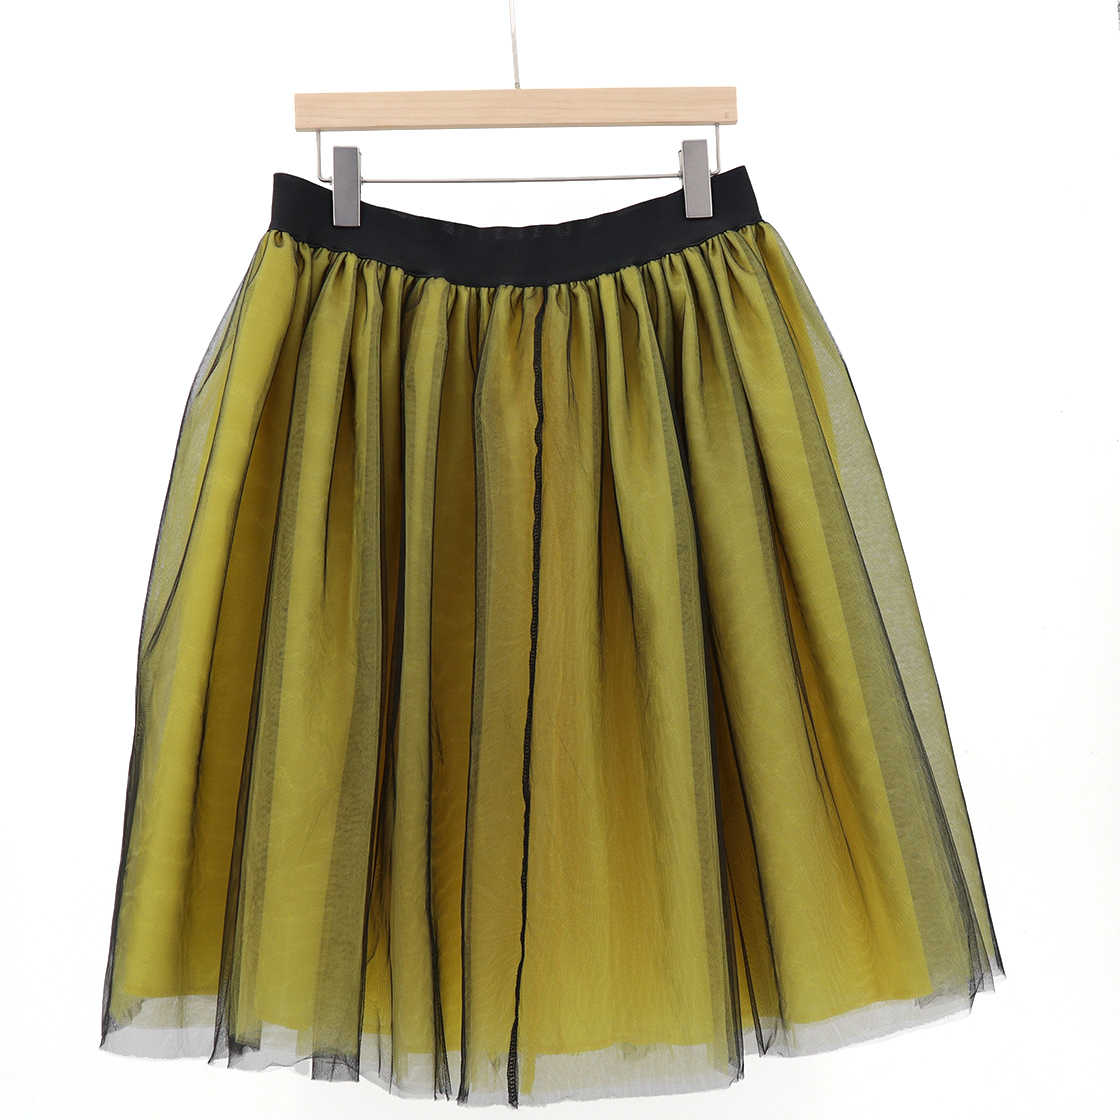 8eb42bb5b Detalle Comentarios Preguntas sobre De 6 capas de tul falda Tutu ...